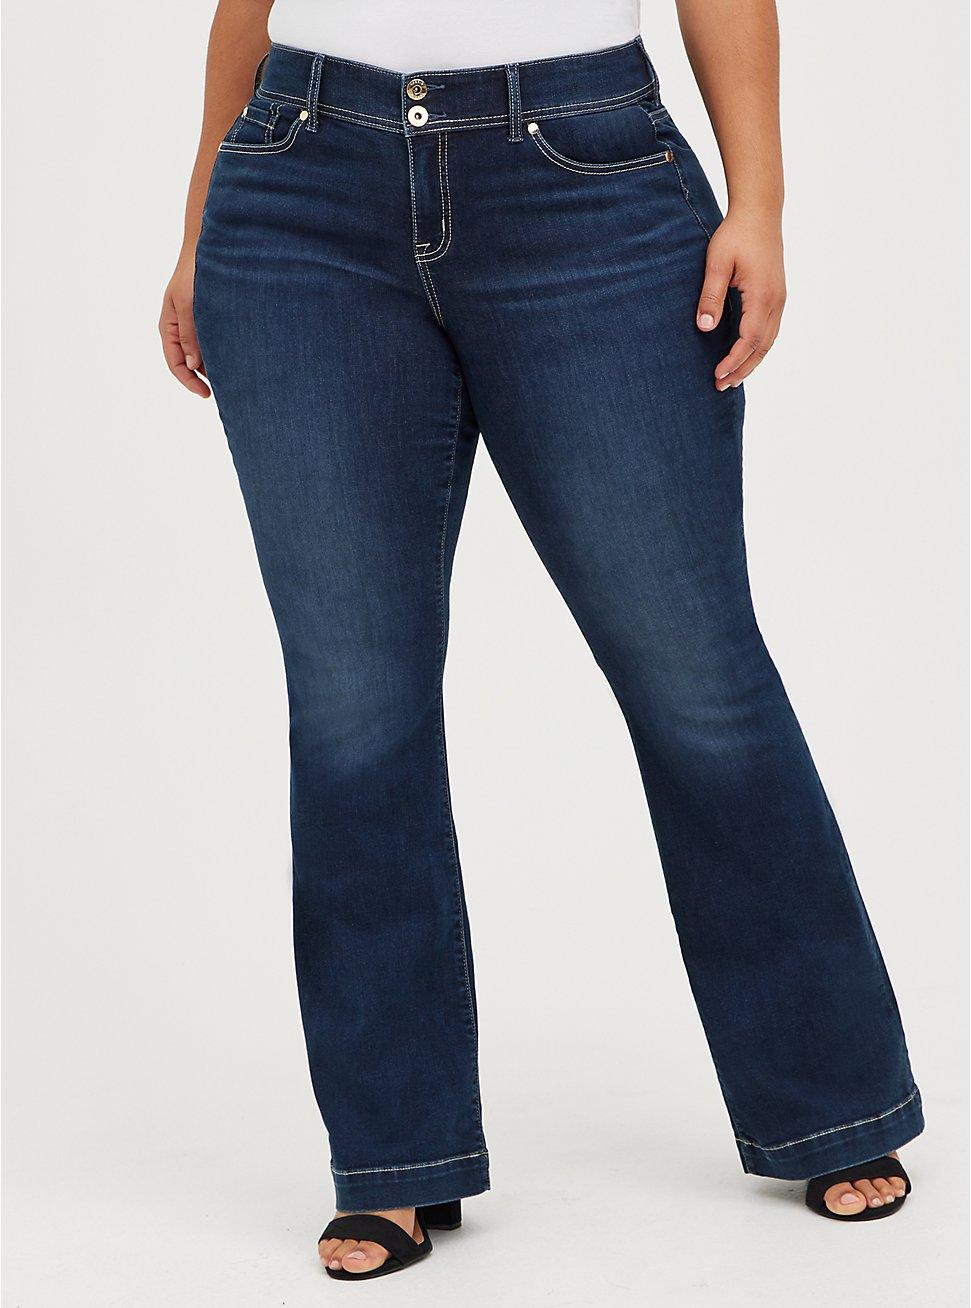 Plus Size Mid Rise Flare Jean - Super Soft Dark Wash, LUNATION, hi-res